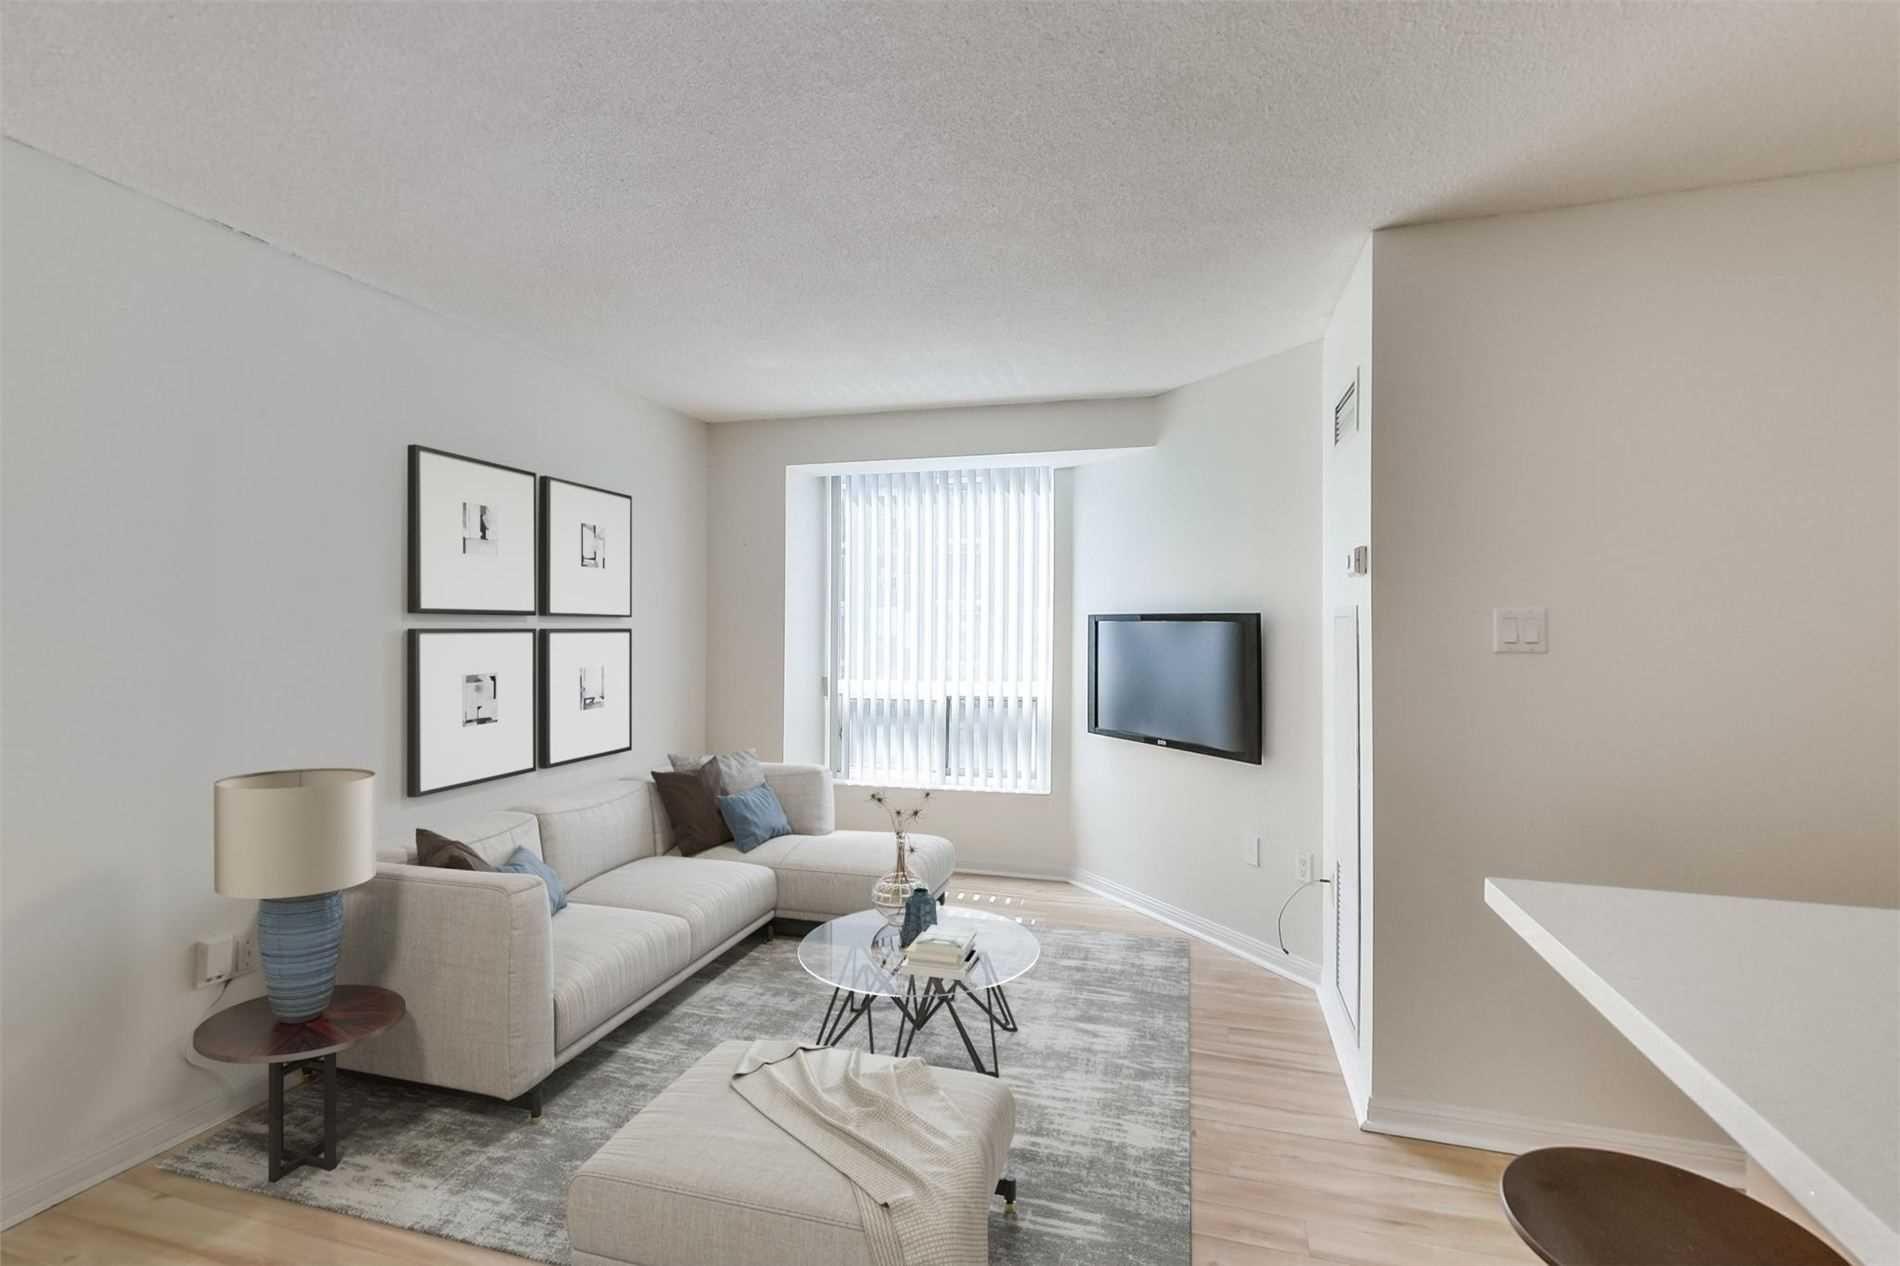 Photo 6: Photos: 808 109 E Front Street in Toronto: Moss Park Condo for lease (Toronto C08)  : MLS®# C4816382